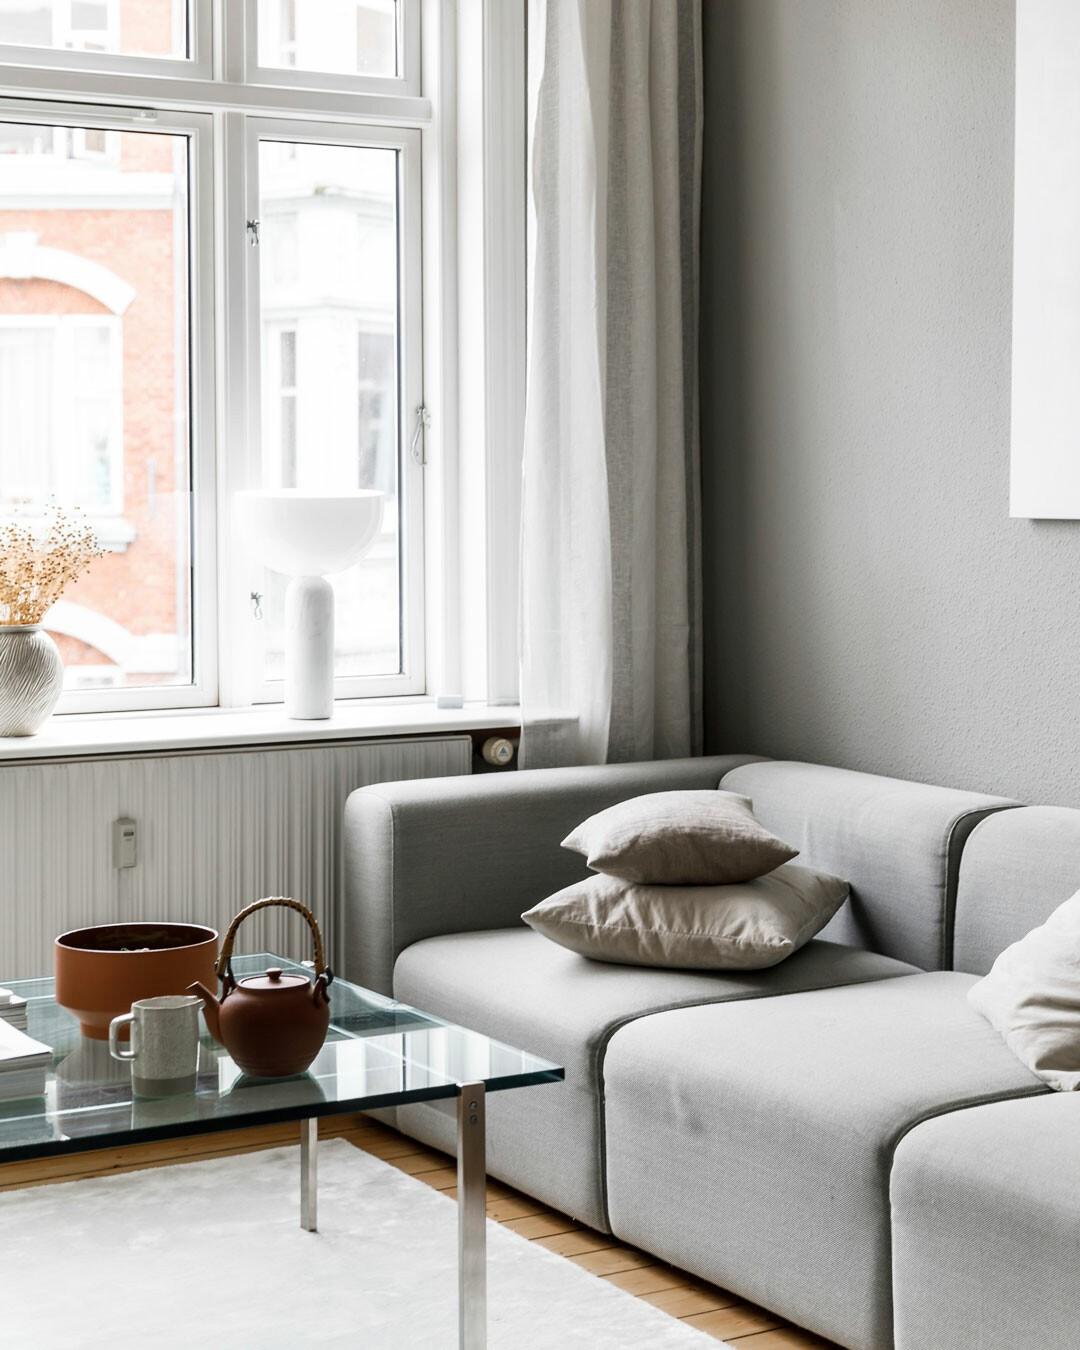 Moderno apartamento minimalista danés, con alma vieja